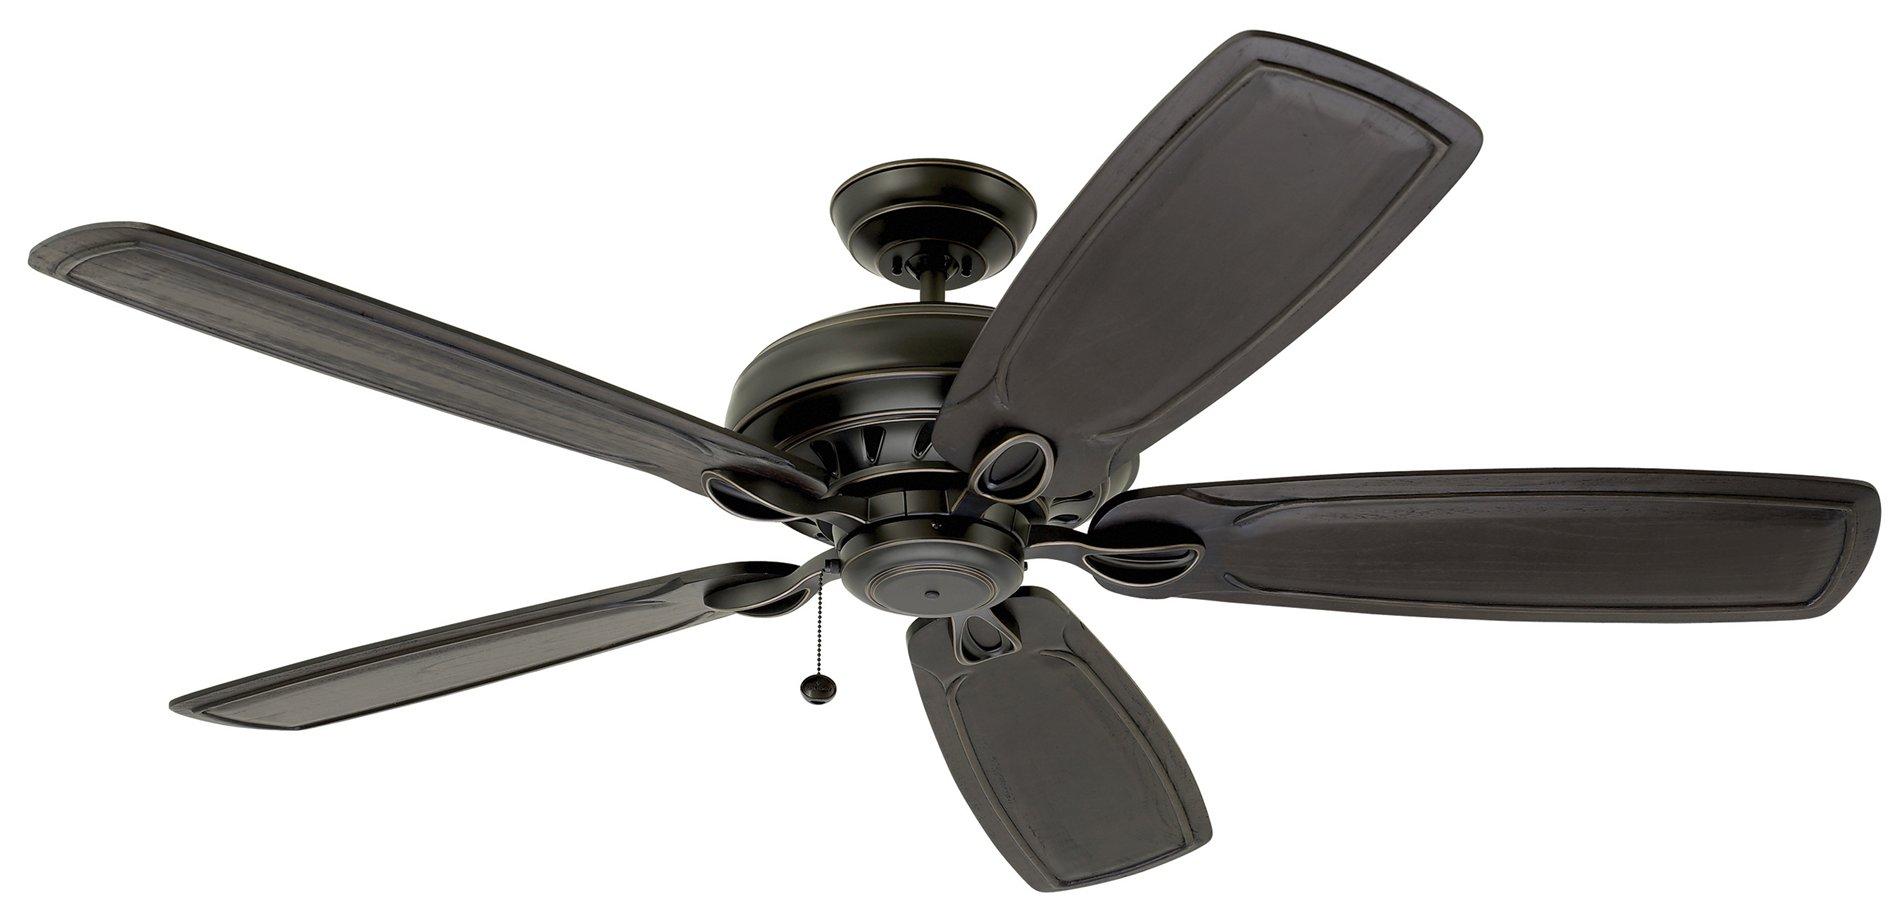 Emerson Cf5100 Penbrooke Select Transitional Ceiling Fan